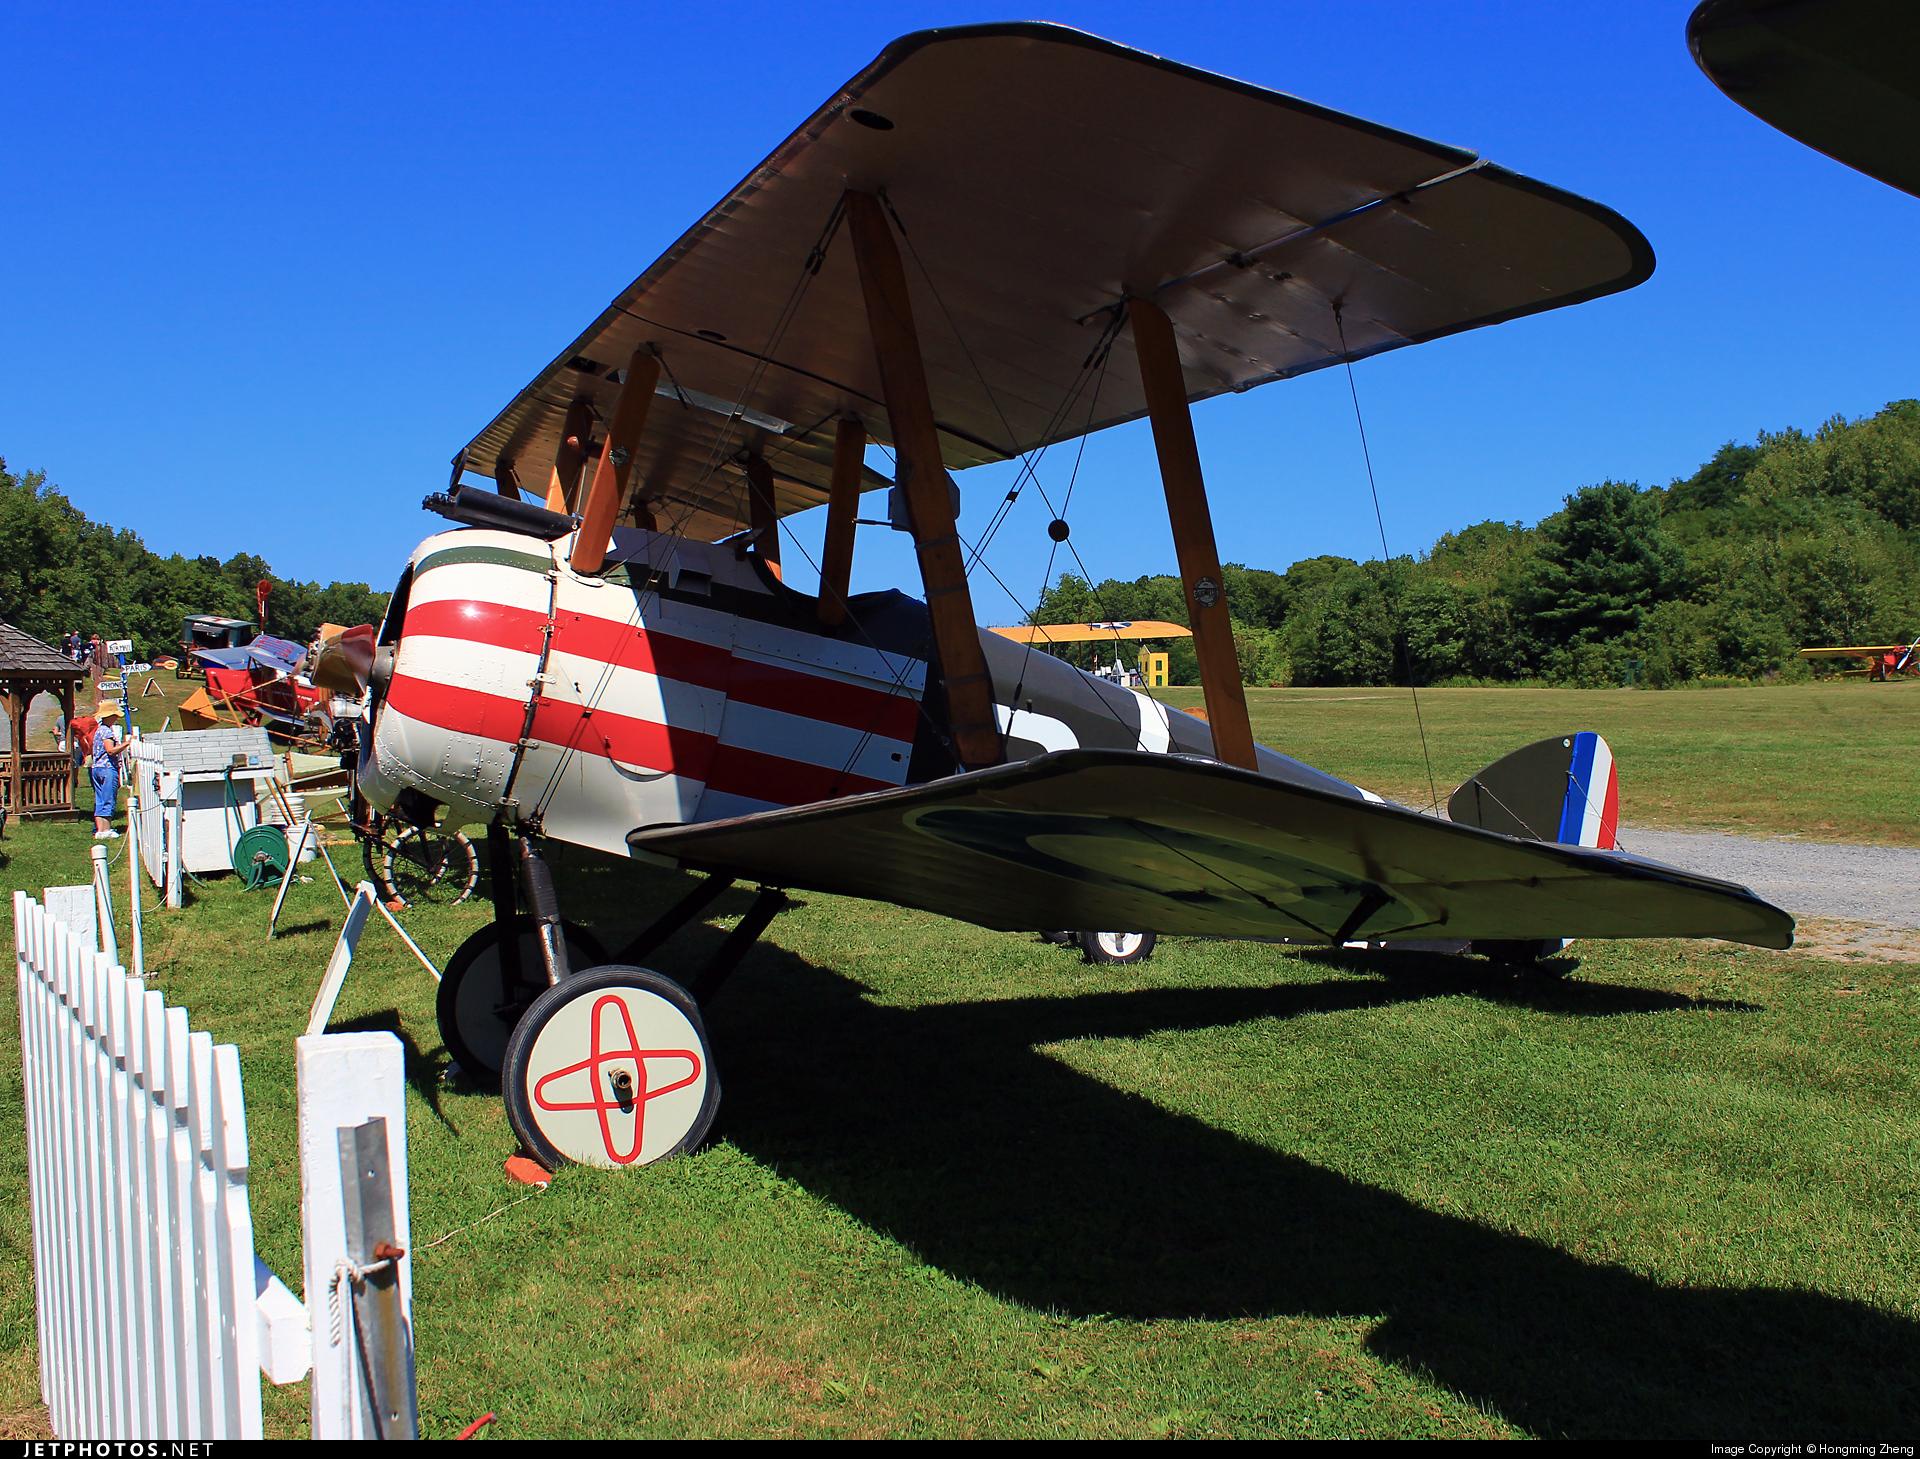 N7157q Sopwith Camel F 1 Old Rhinebeck Aerodrome Museum